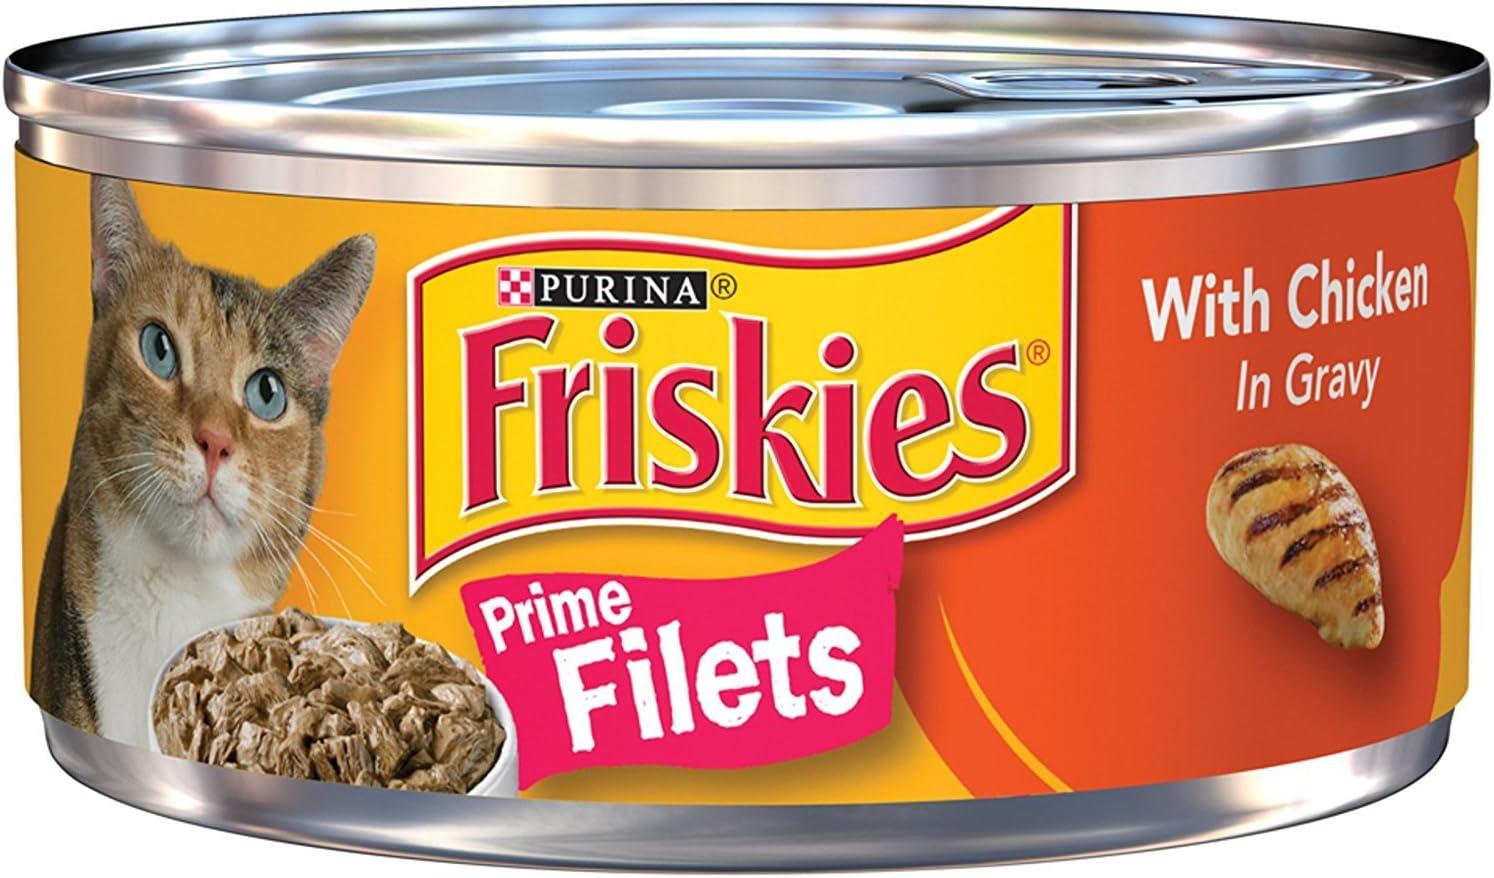 Purina Friskies Prime Filets Wet Cat Food - (24) 5.5 oz. Cans